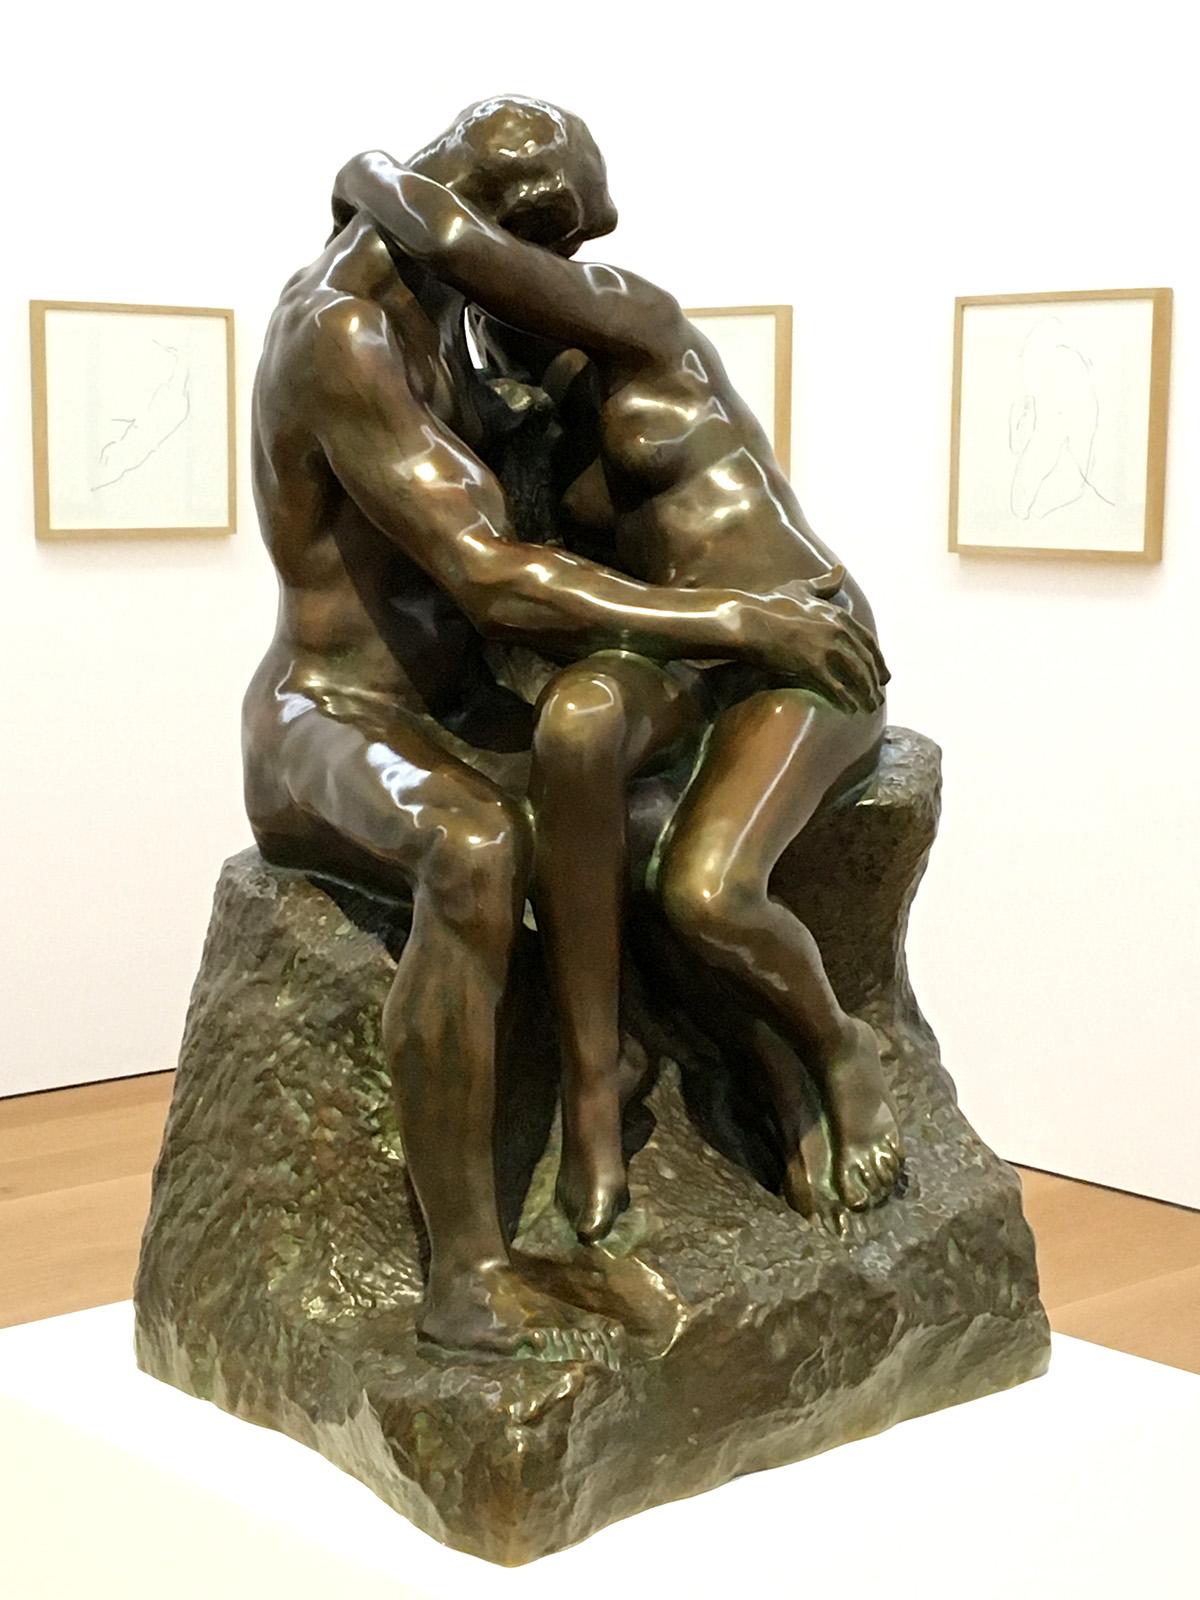 <em>Auguste Rodin - The Kiss, bronze; Denis Savary Untitled series, graphite</em>